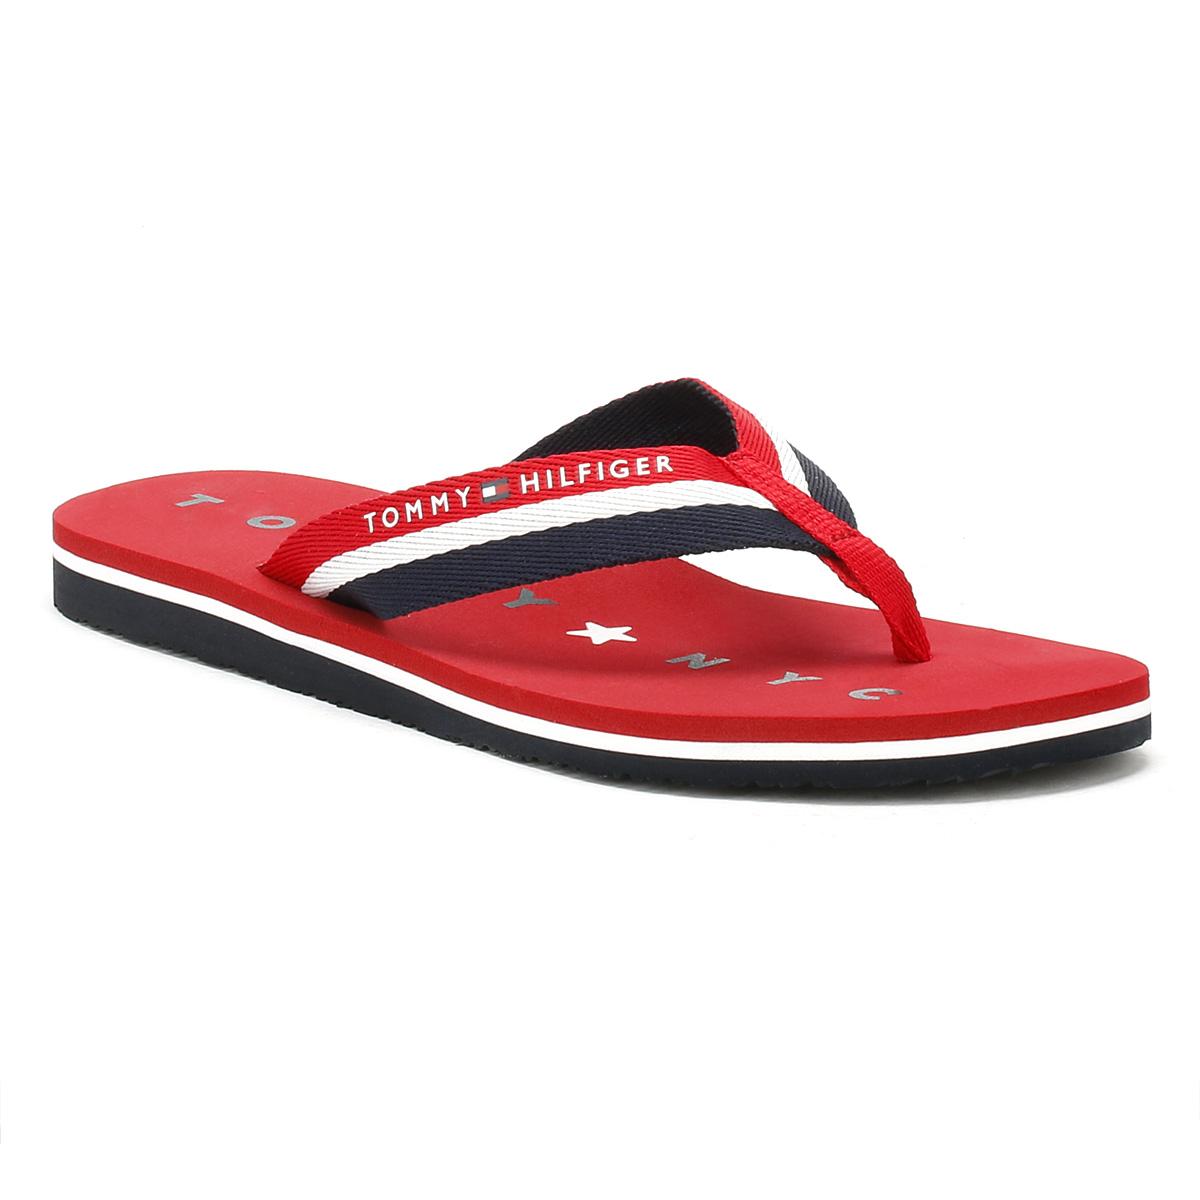 0324107c163c Tommy Hilfiger Womens Flip Flops Tango Red Blue Ladies Beach Thong ...